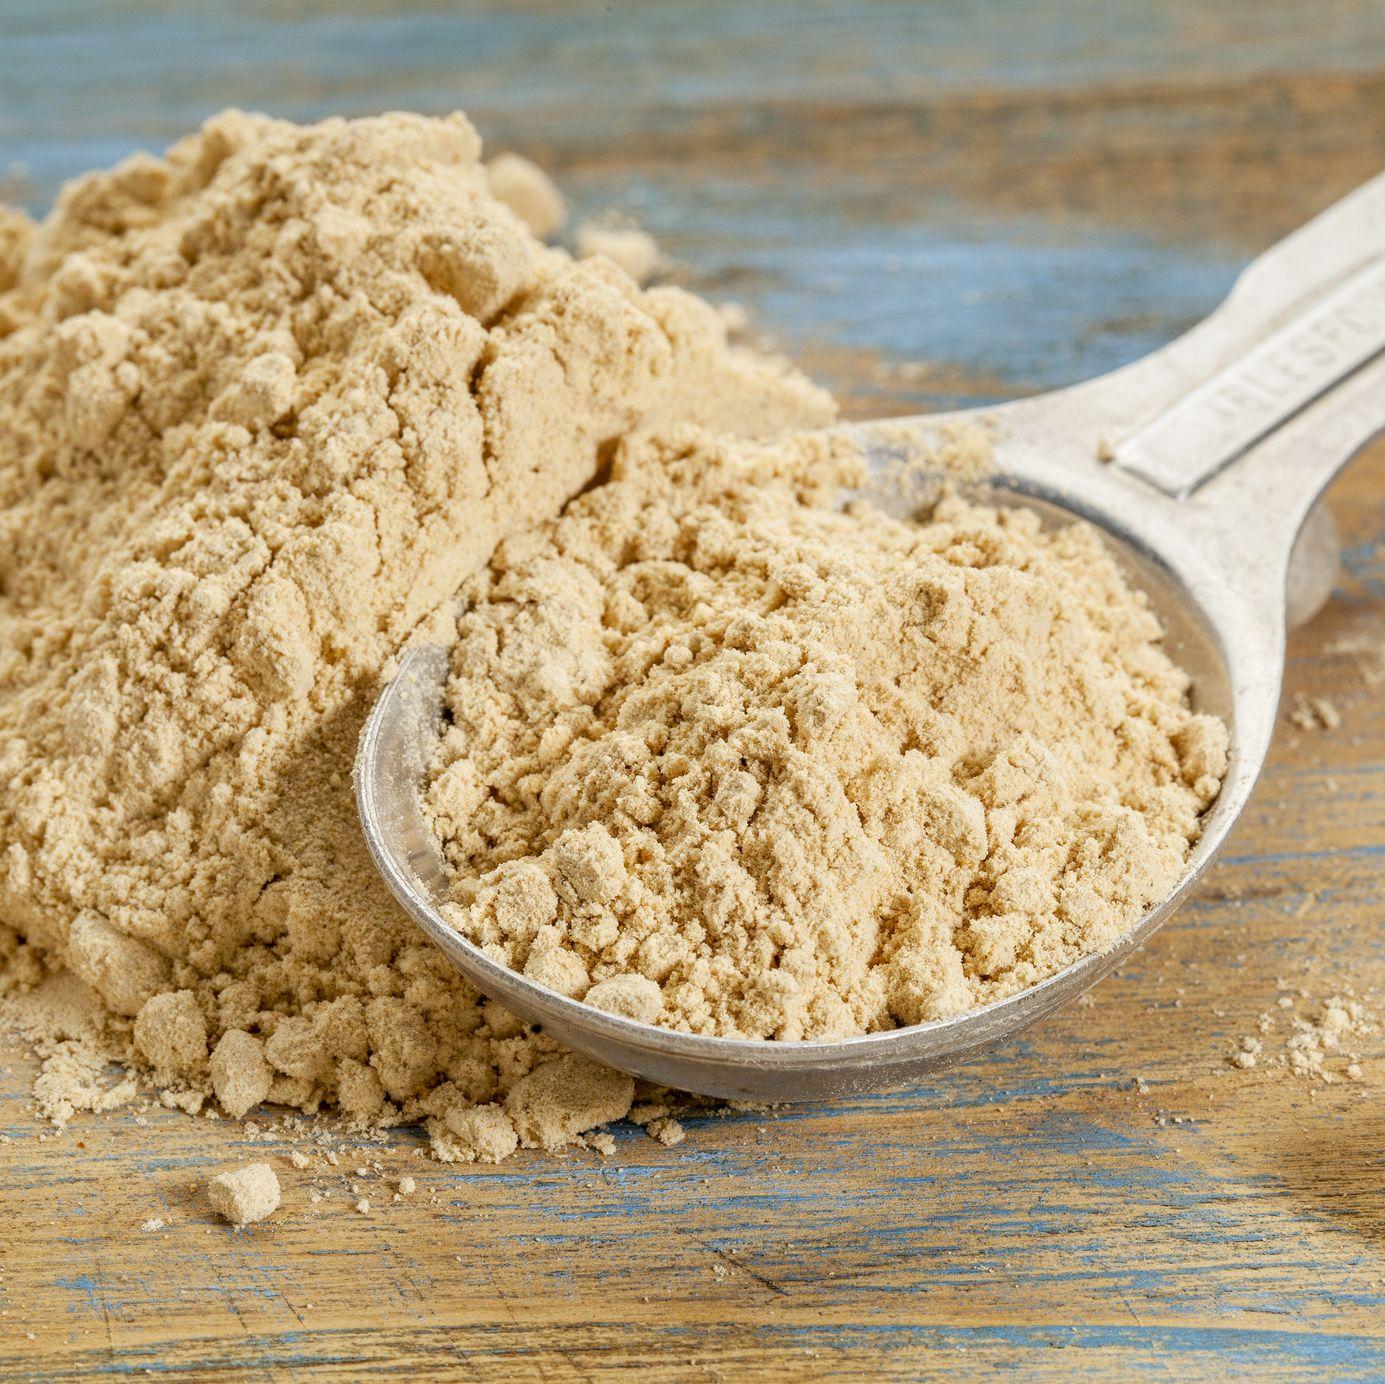 Benefits of Maca Root: How It Impacts Your Hormones, Libido, and Energy